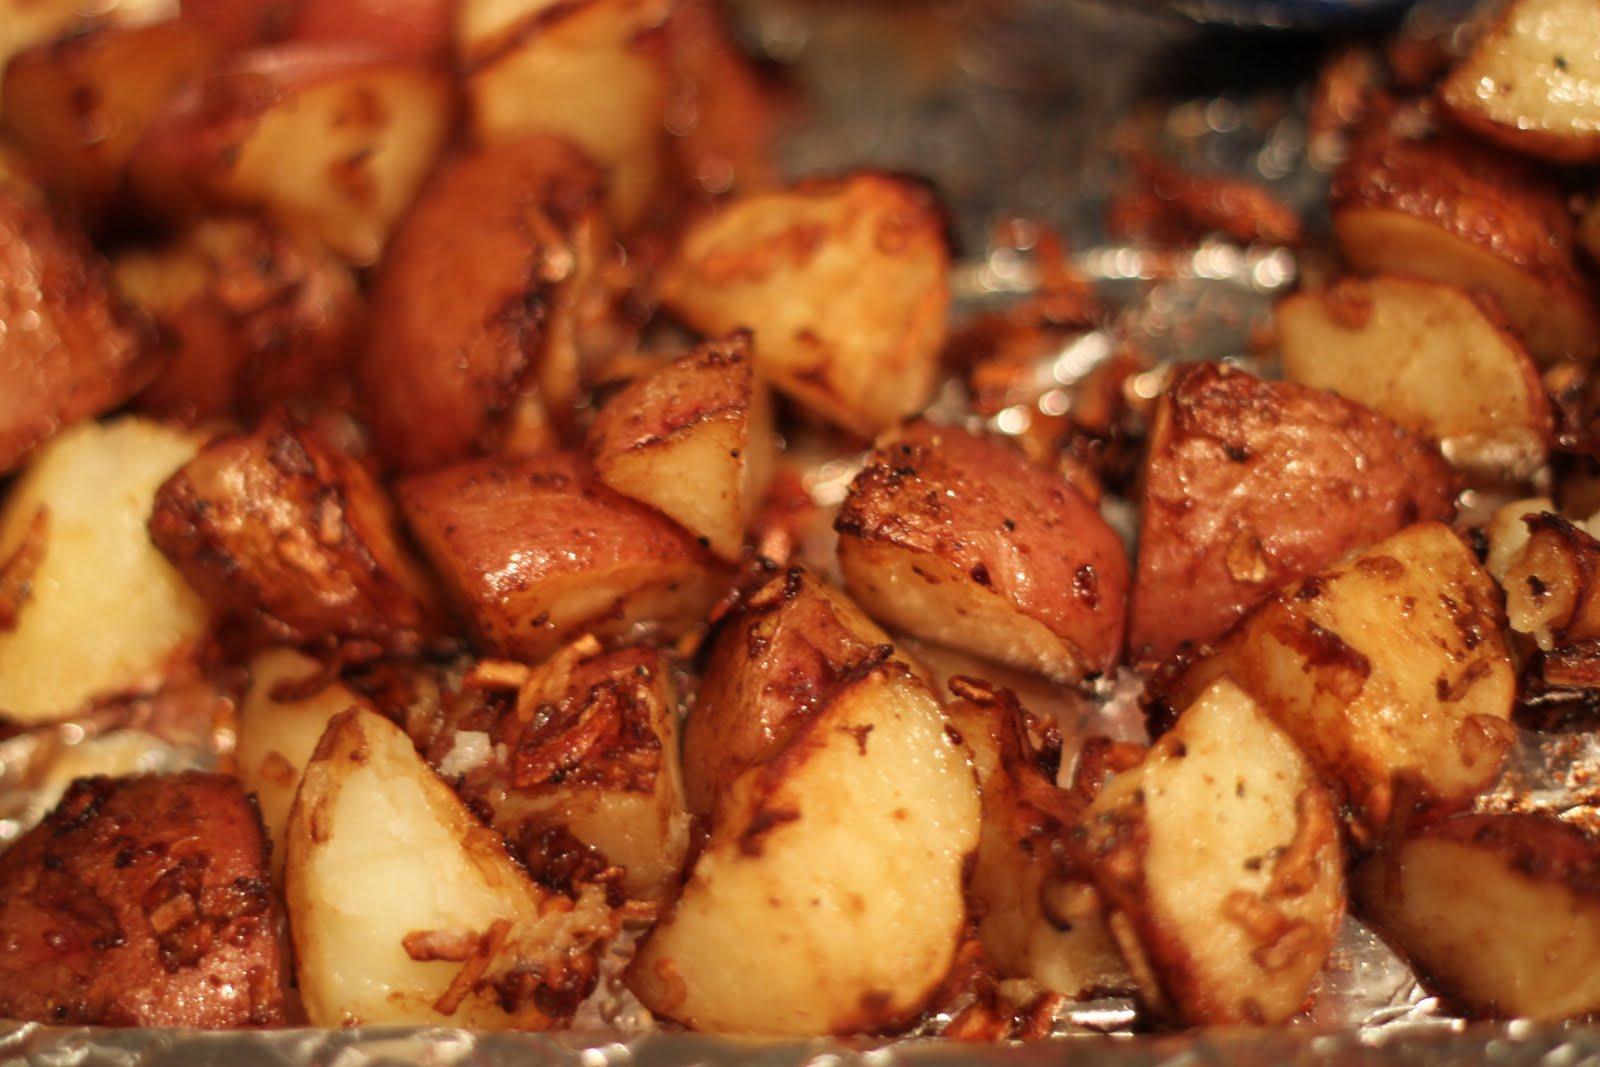 Lipton Onion Soup Mix Potatoes